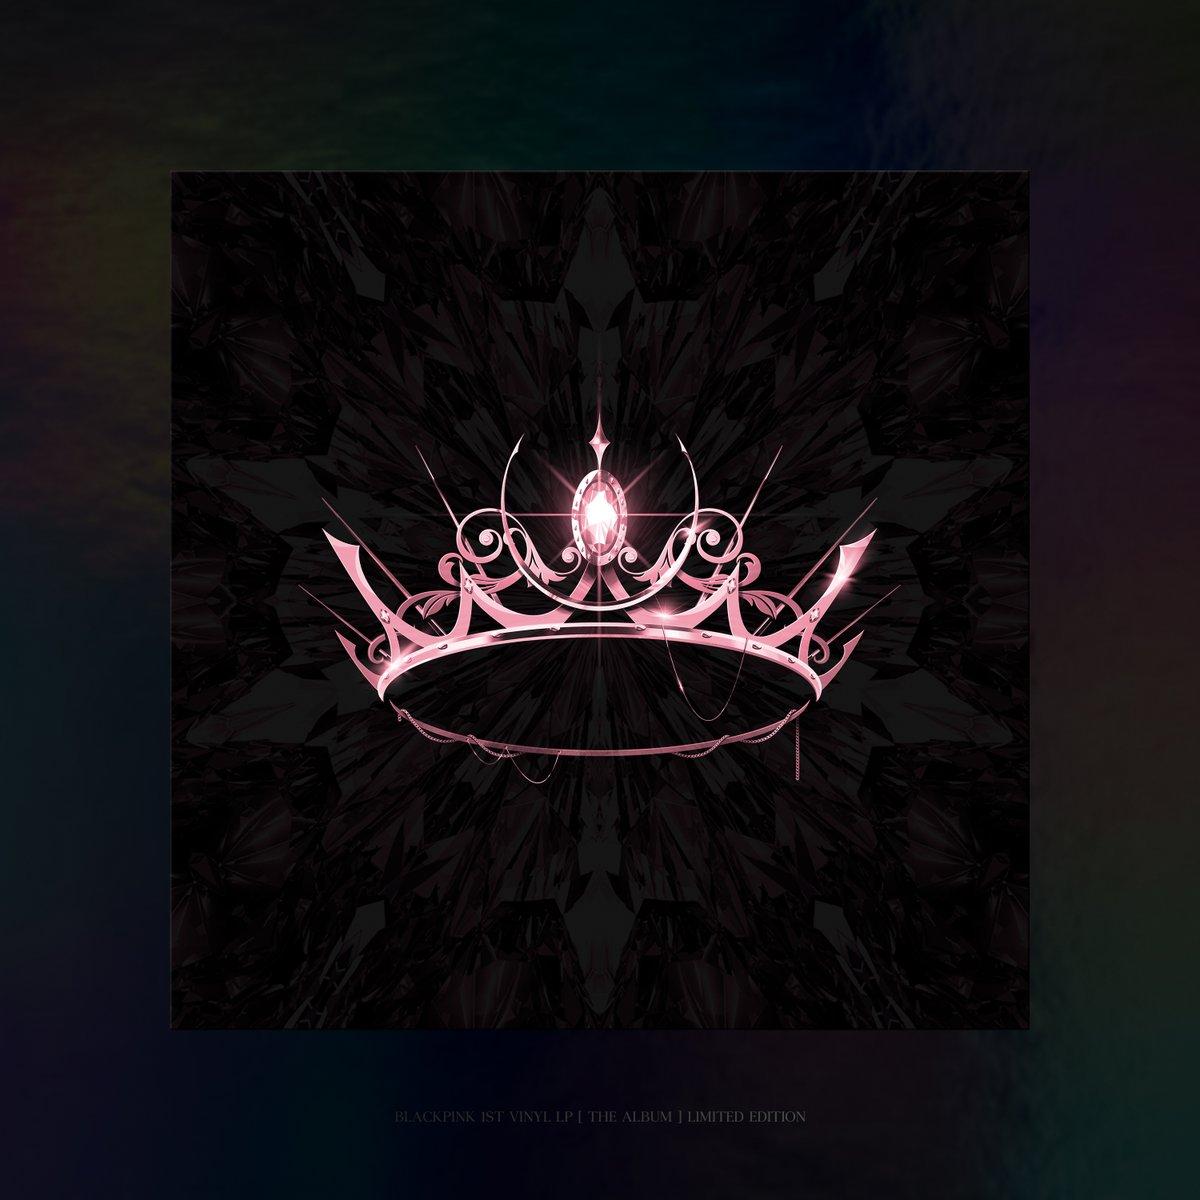 #BLACKPINK 1st VINYL LP [THE ALBUM] -LIMITED EDITION- Pre-order notice has been uploaded ▶️facebook.com/25056488532494… #블랙핑크 #THEALBUM #1stVINYLLP #LIMITEDEDITION #20201006 #OfflineRelease #YG